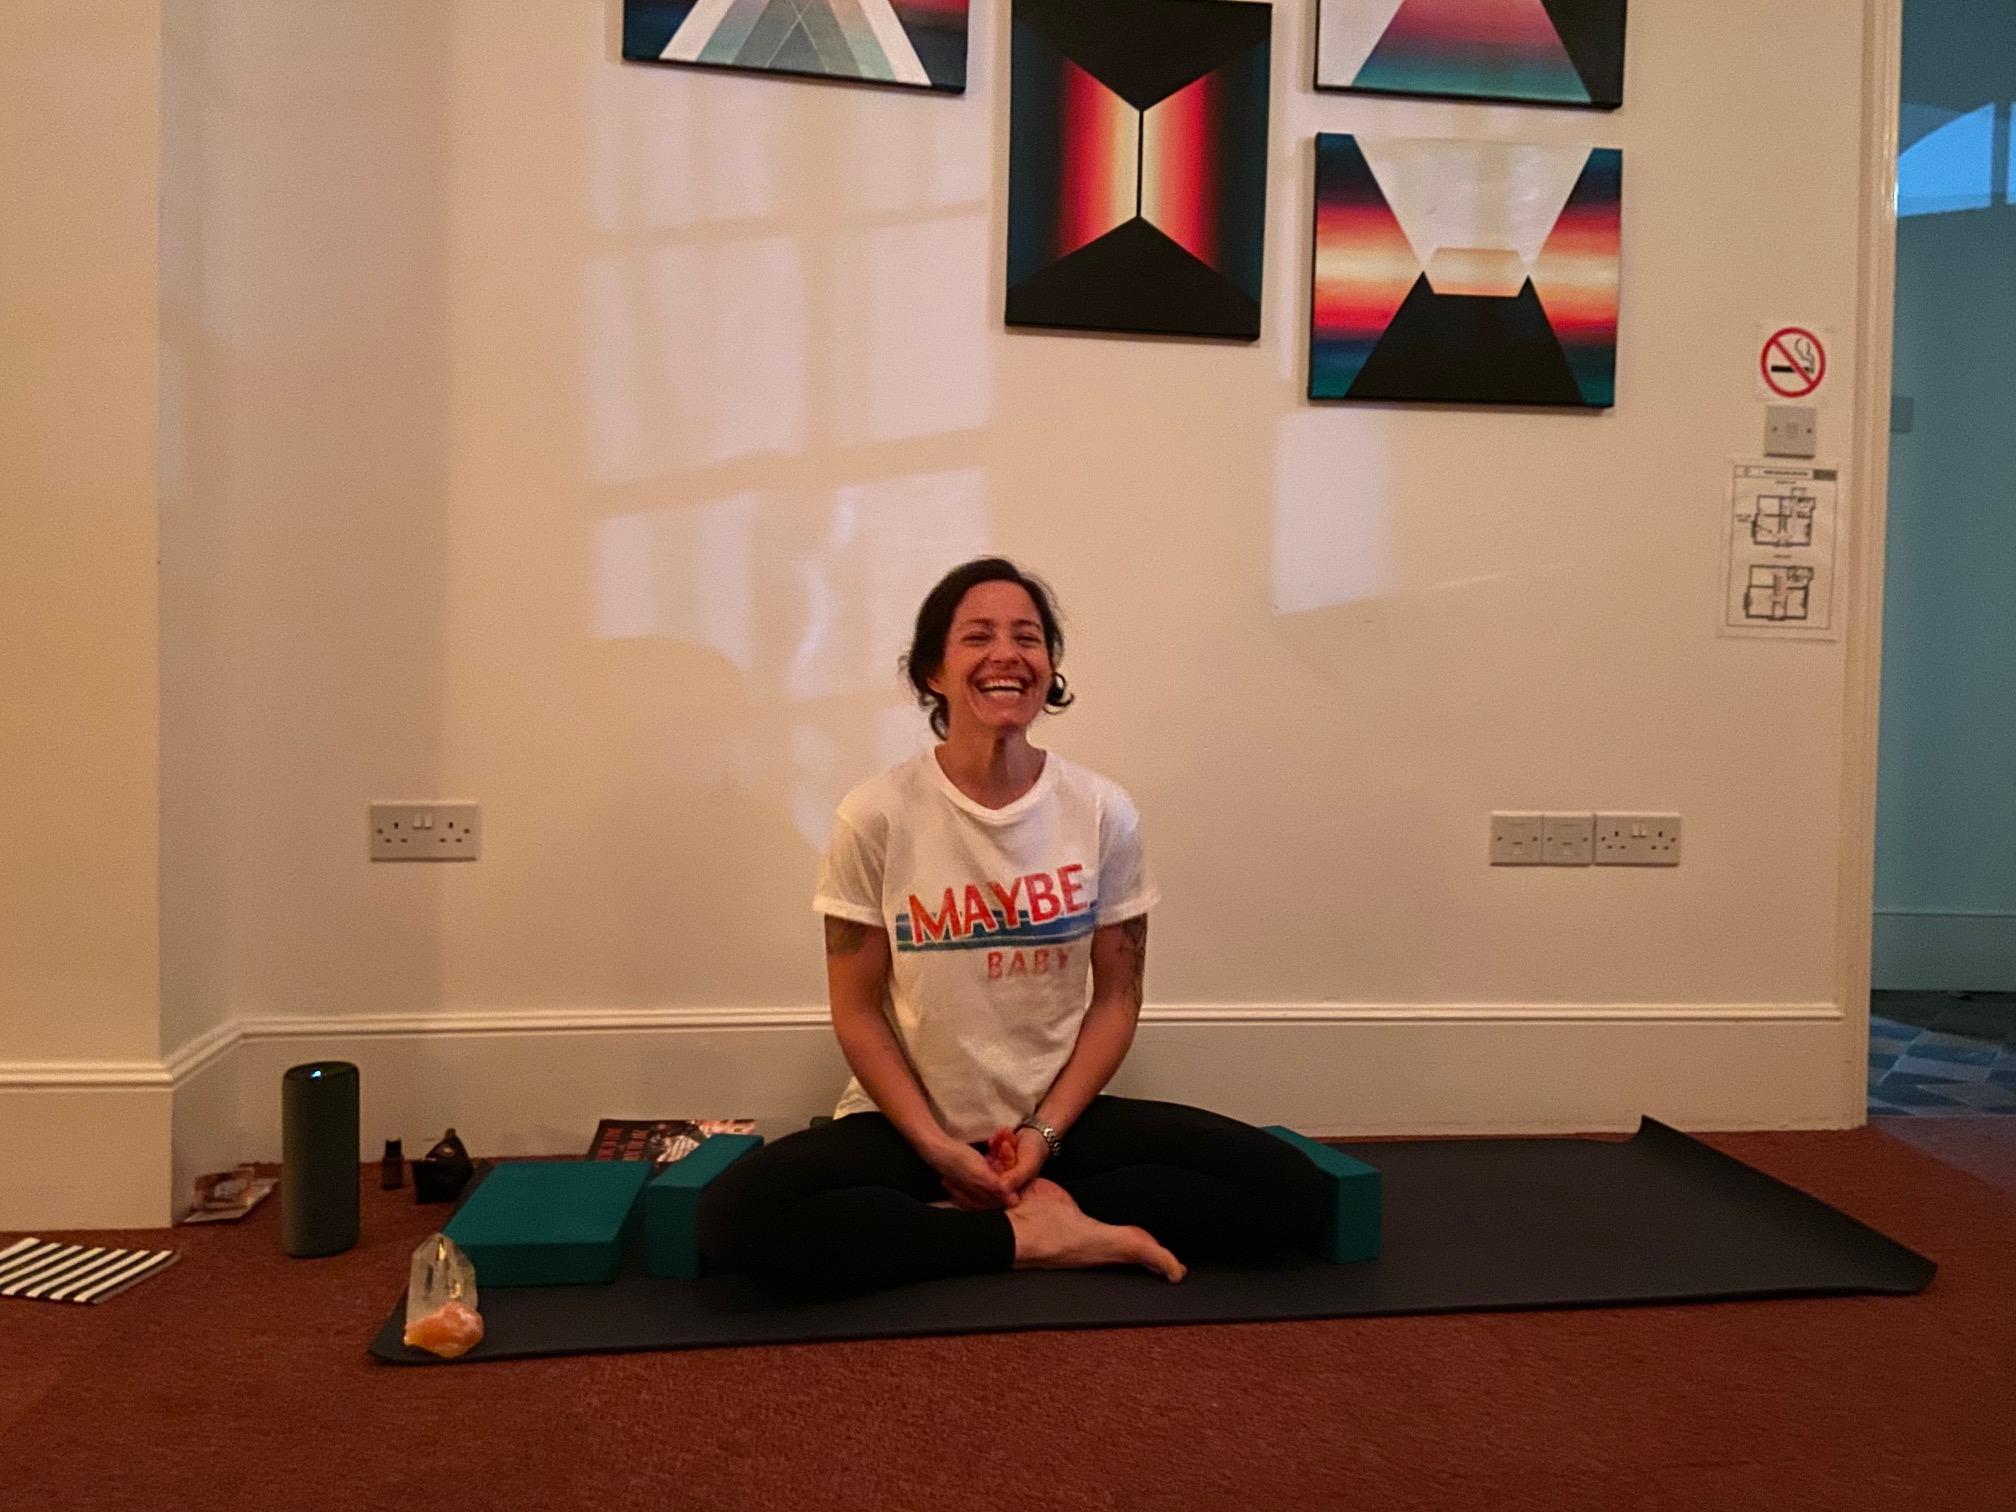 https://integralhealthshrewsbury.com/assets/images/gallery/blog-4/tanya-green-yoga-integral-health-shrewsbury-3.jpg